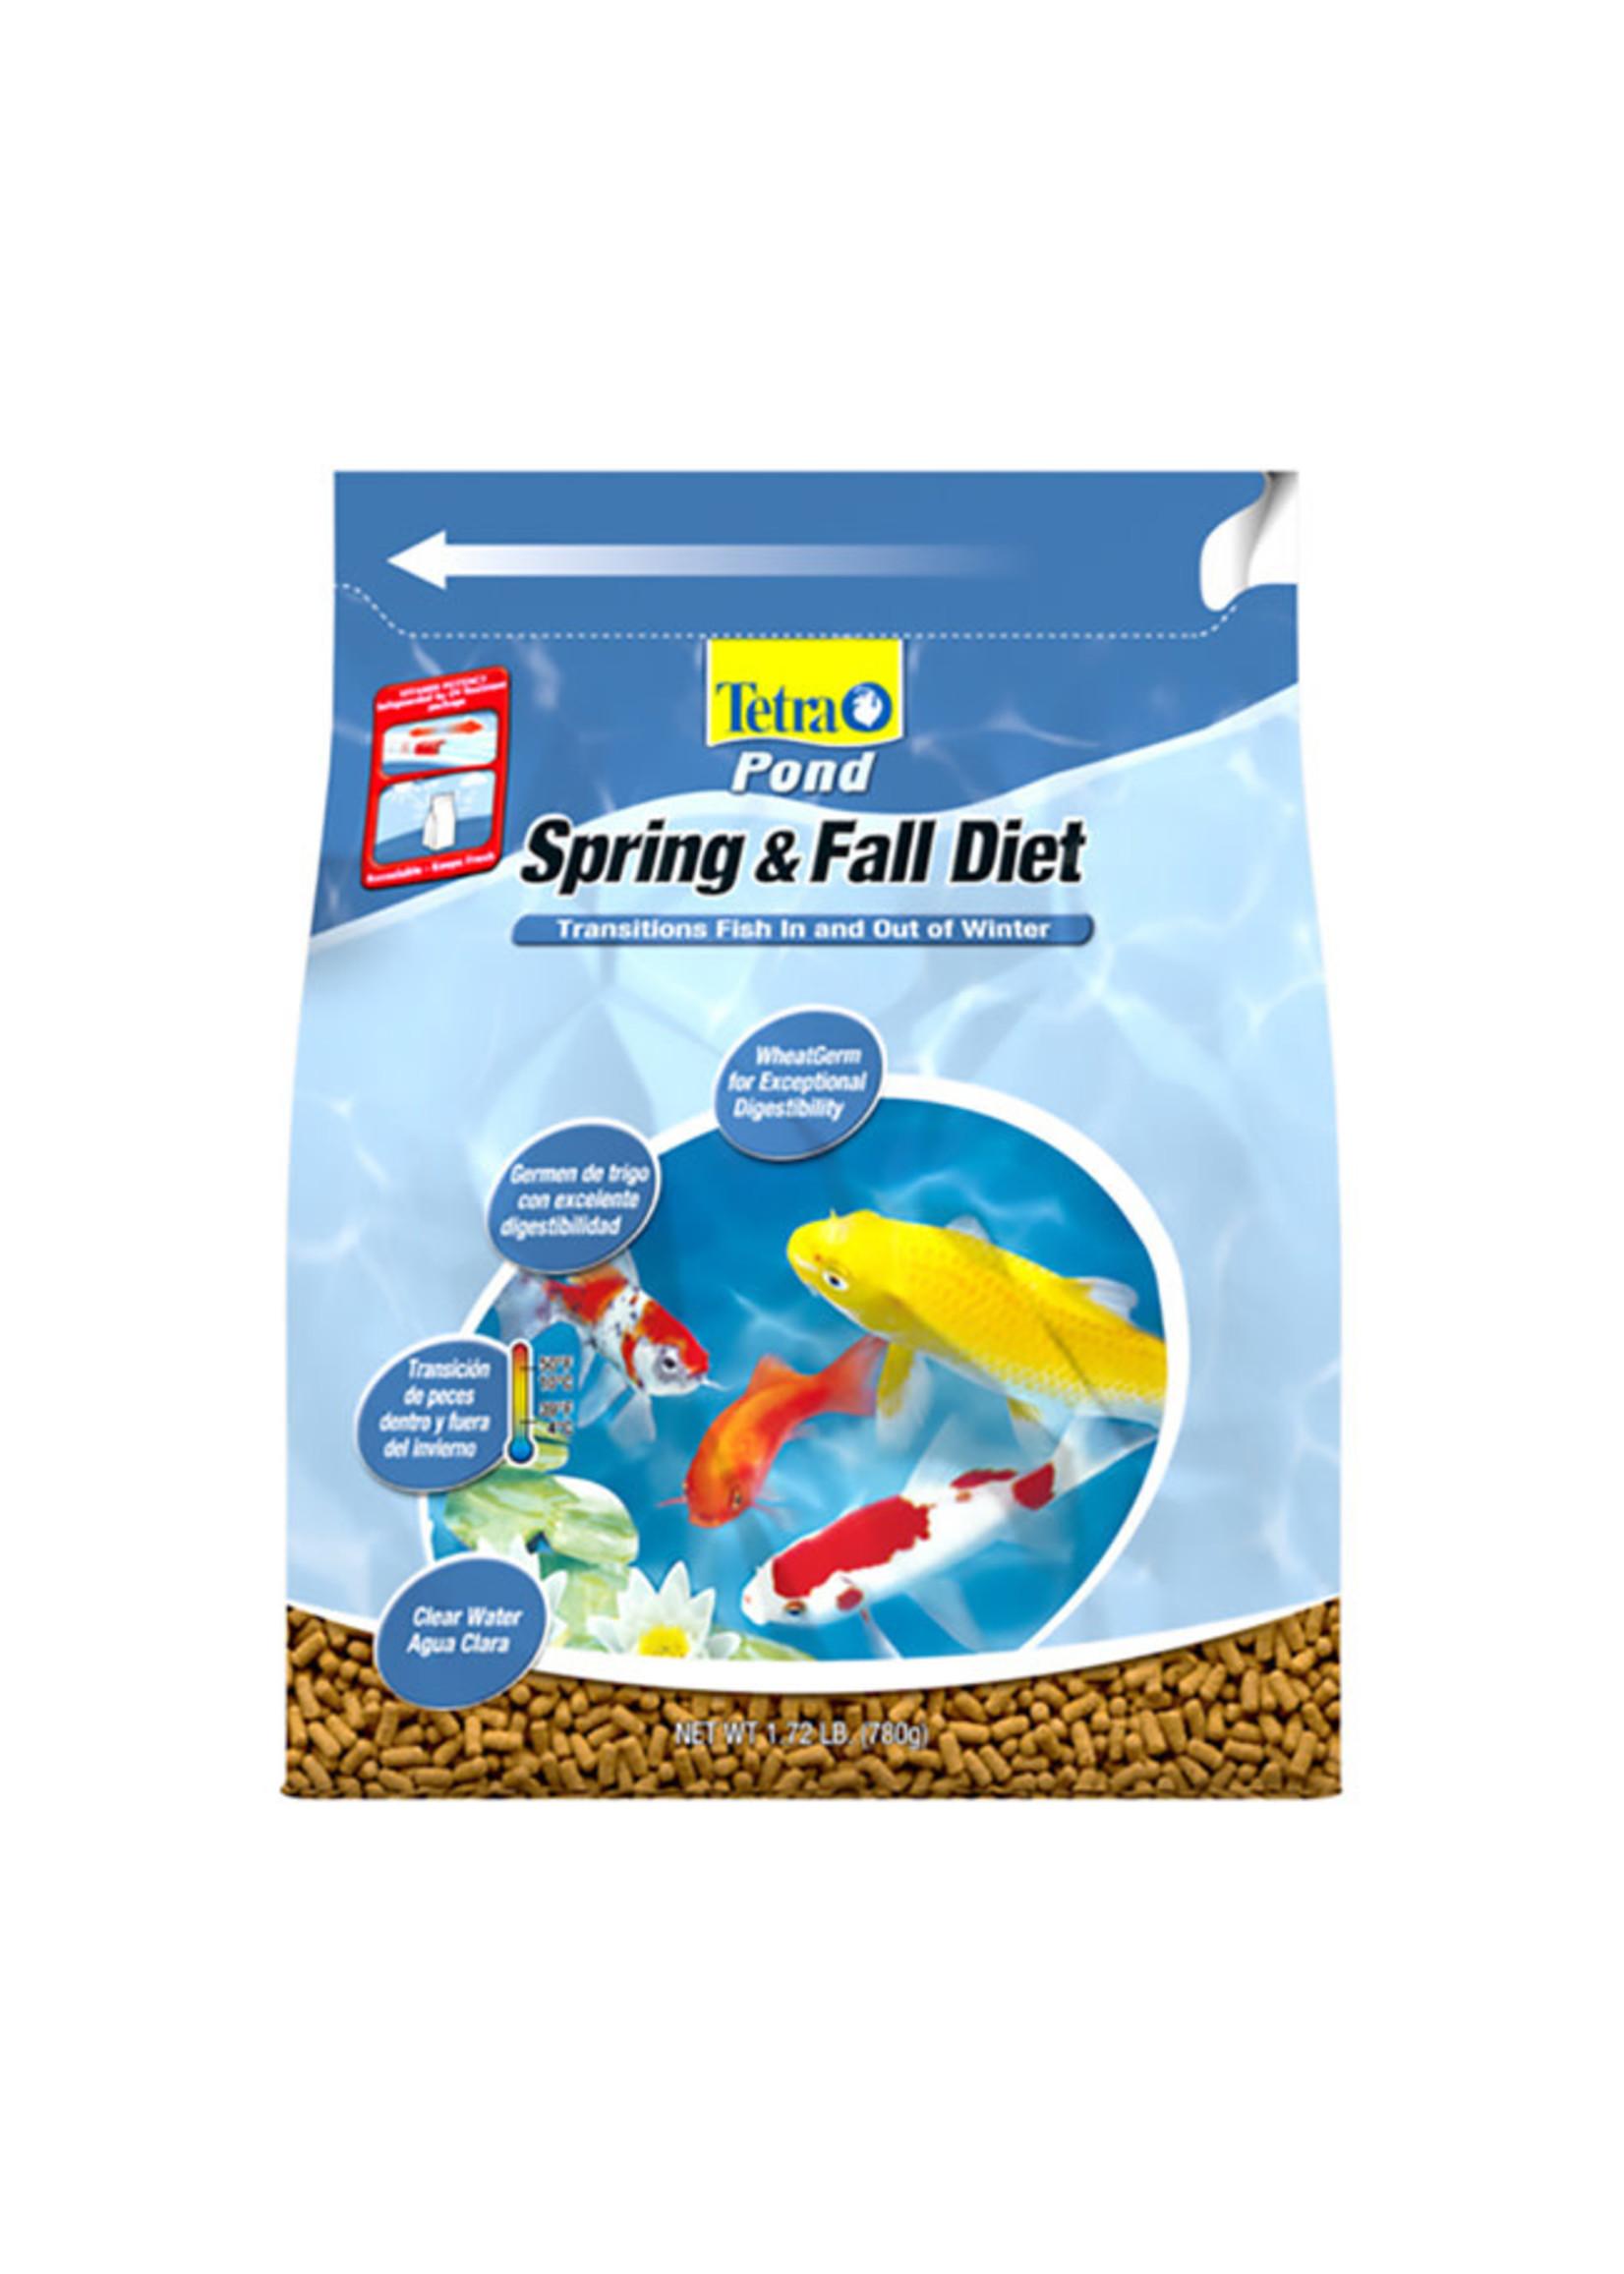 SPECTRUM BRANDS - TETRA Tetra Pond Spring & Fall Diet